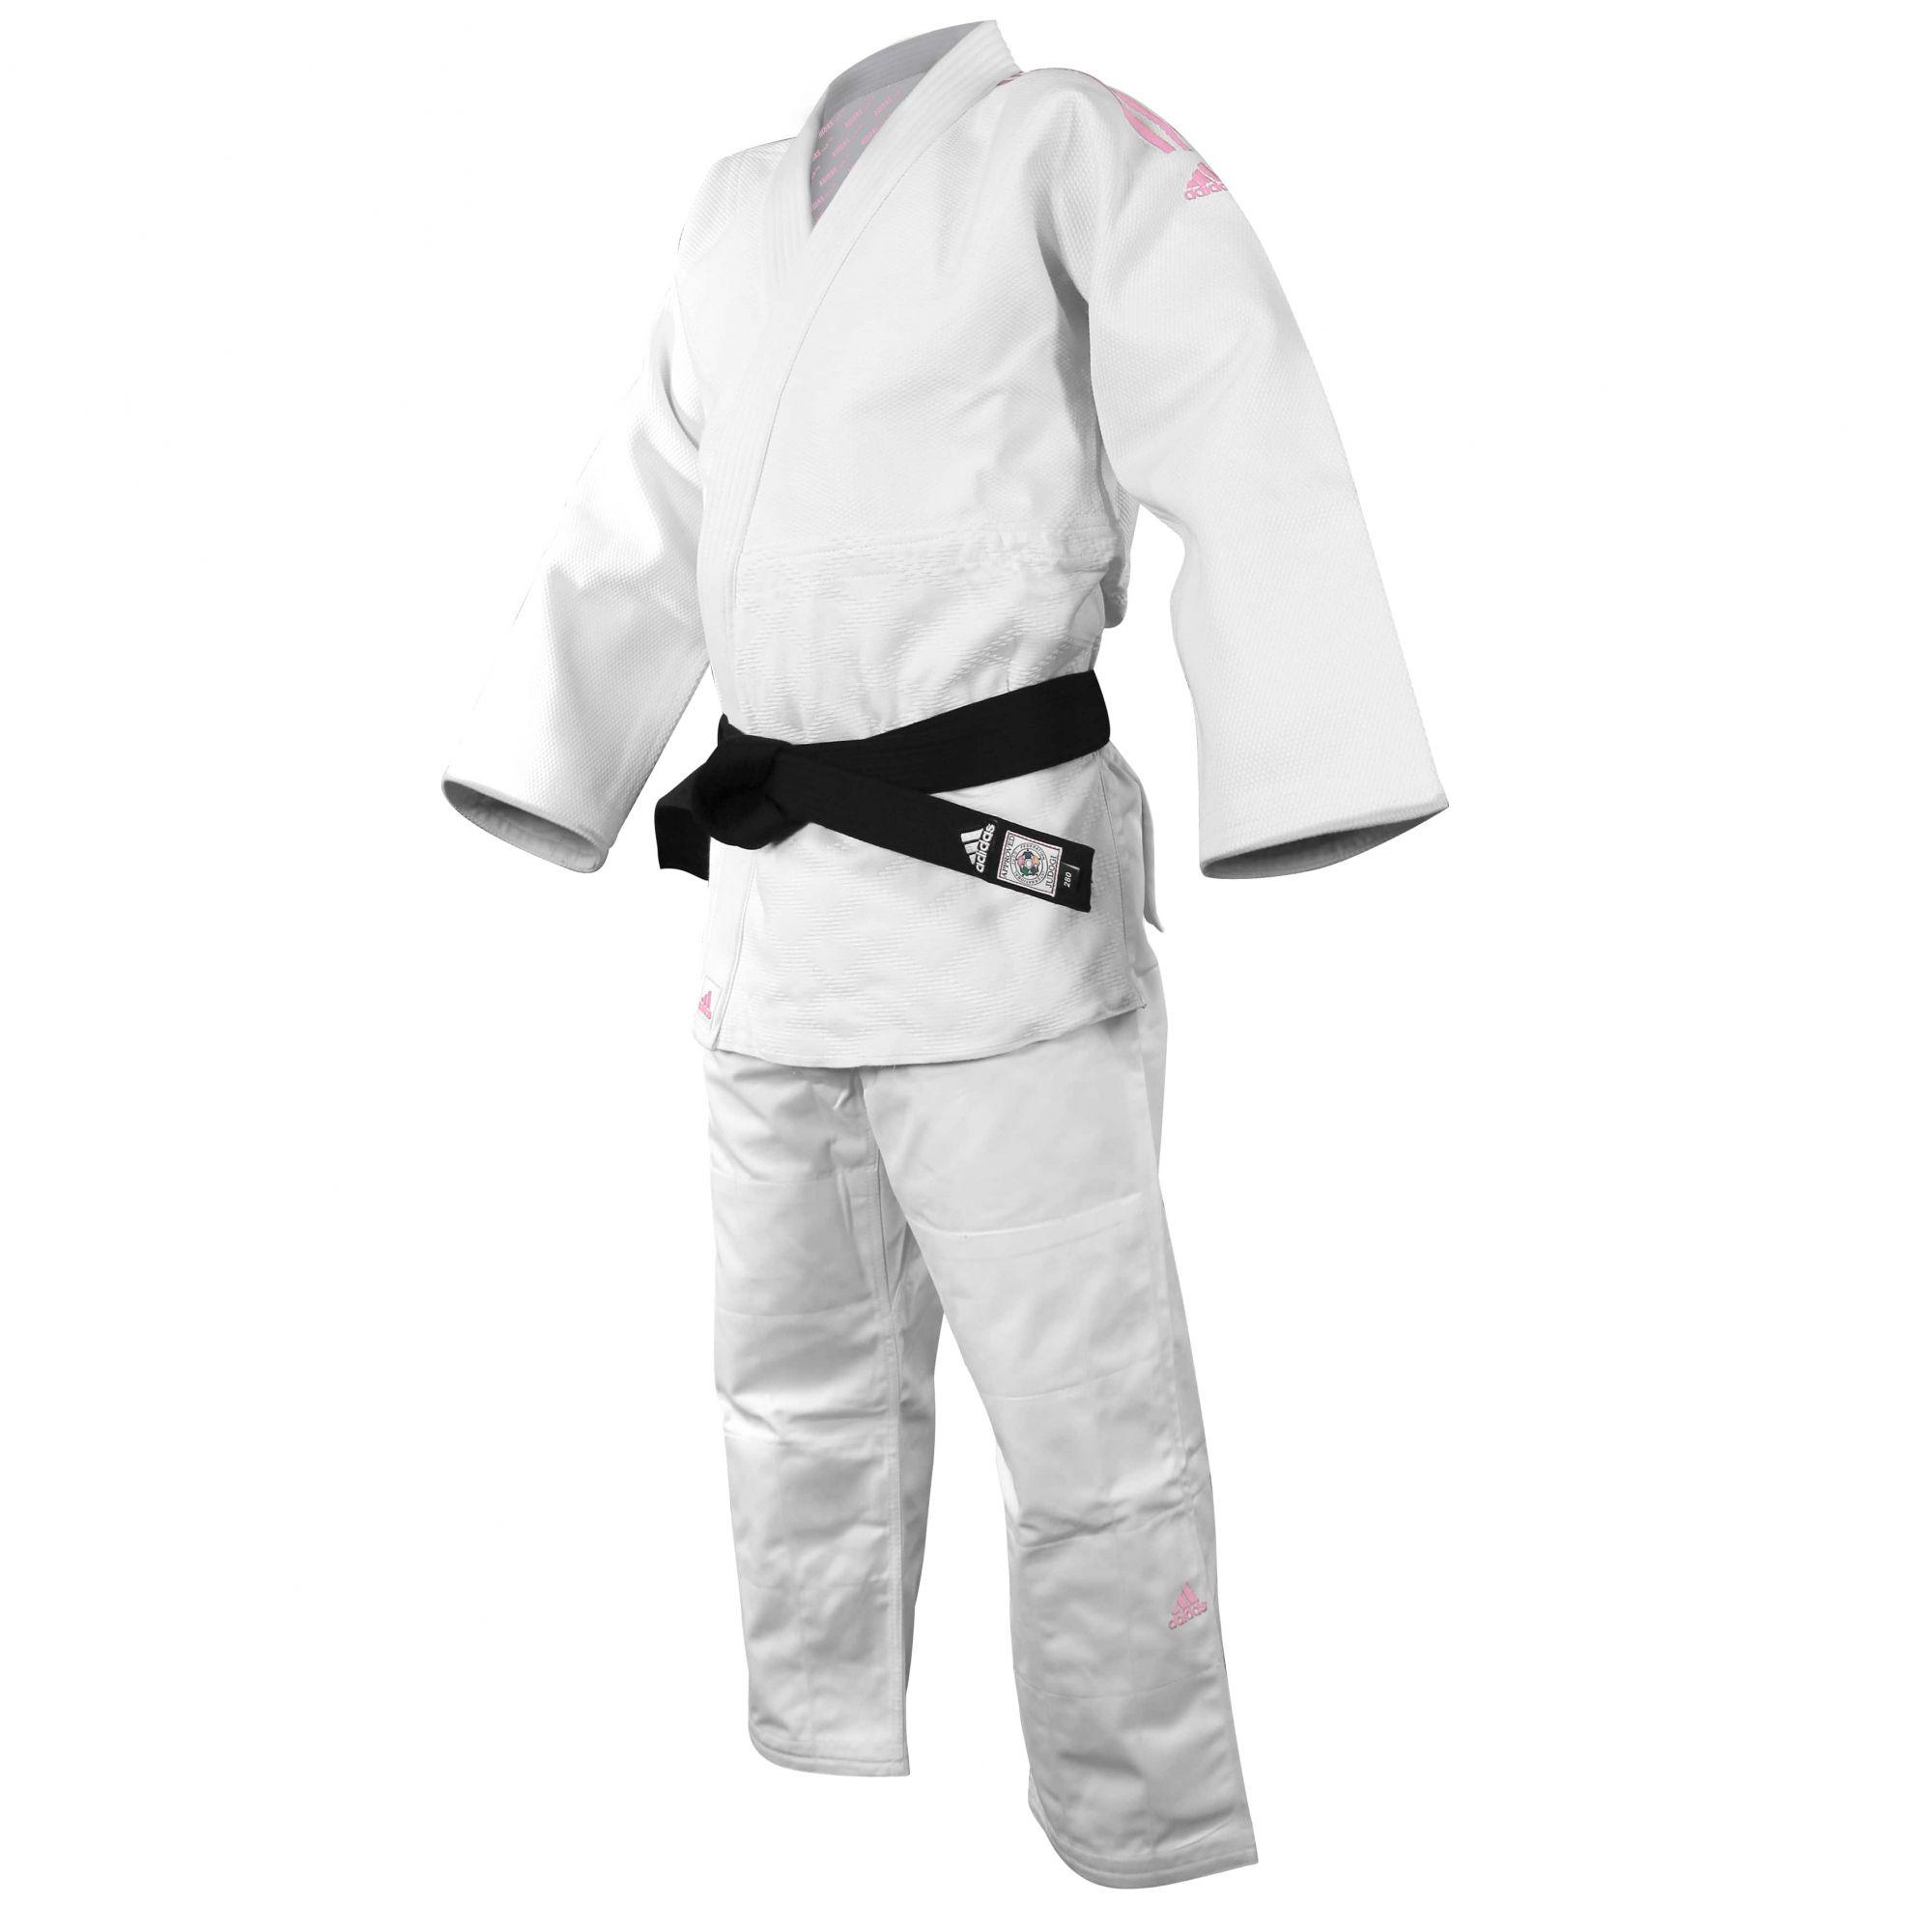 Kimono Judô adidas J990 Millenium Branco com listra Rosa